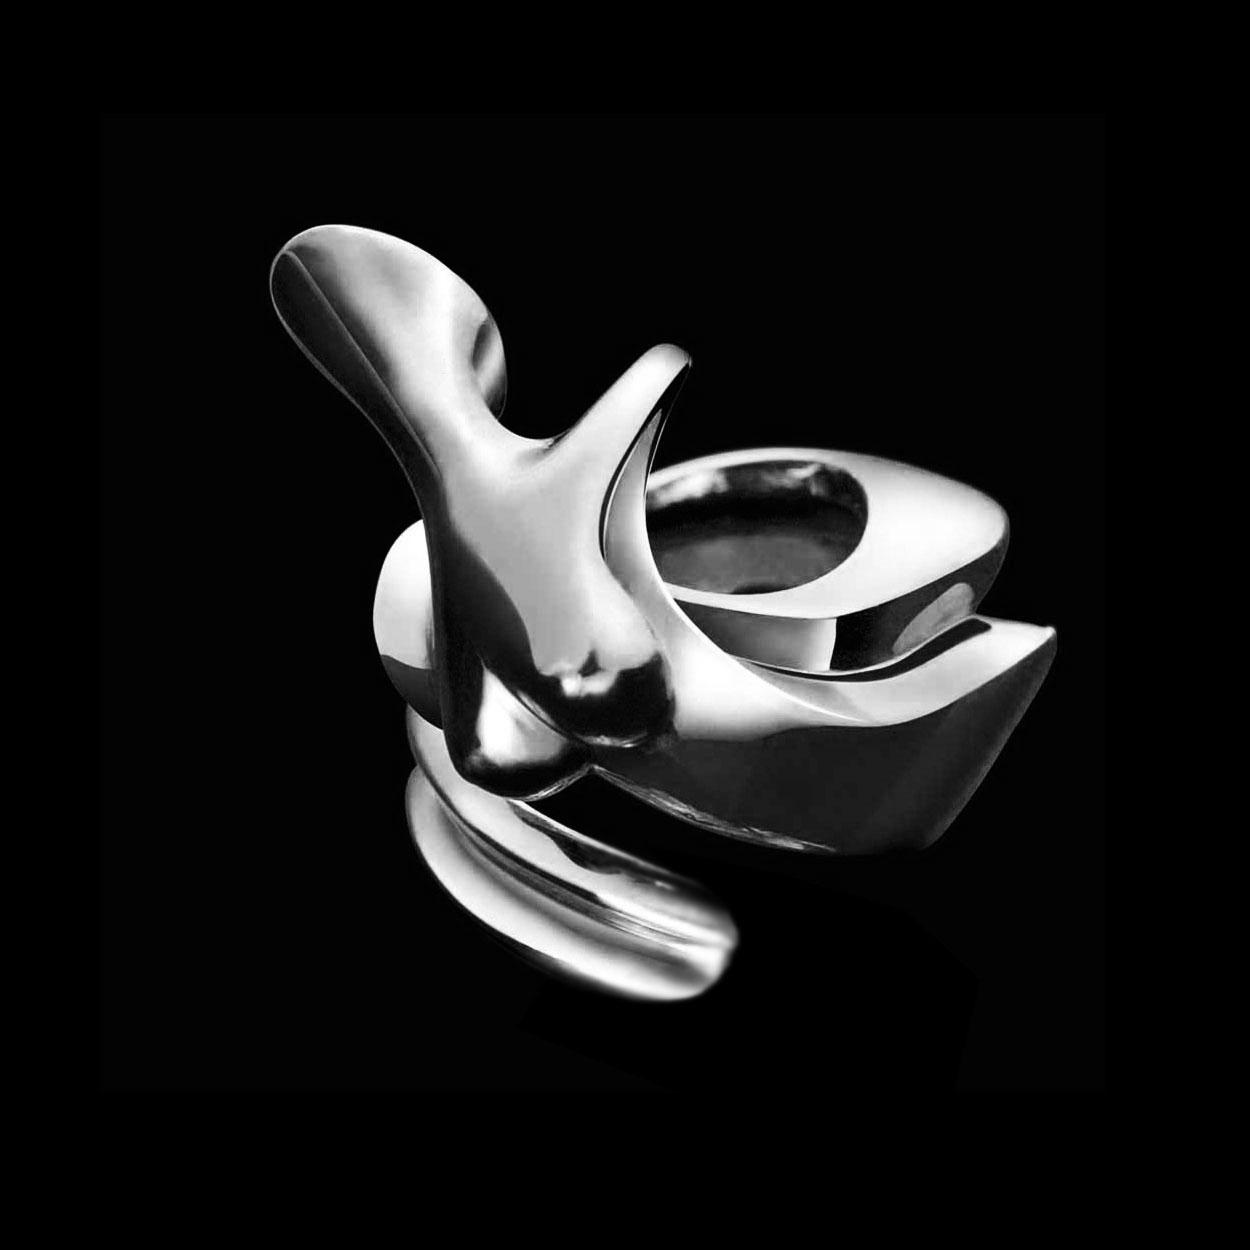 Nina, Silver ring, signed by the artist Marion Bürklé